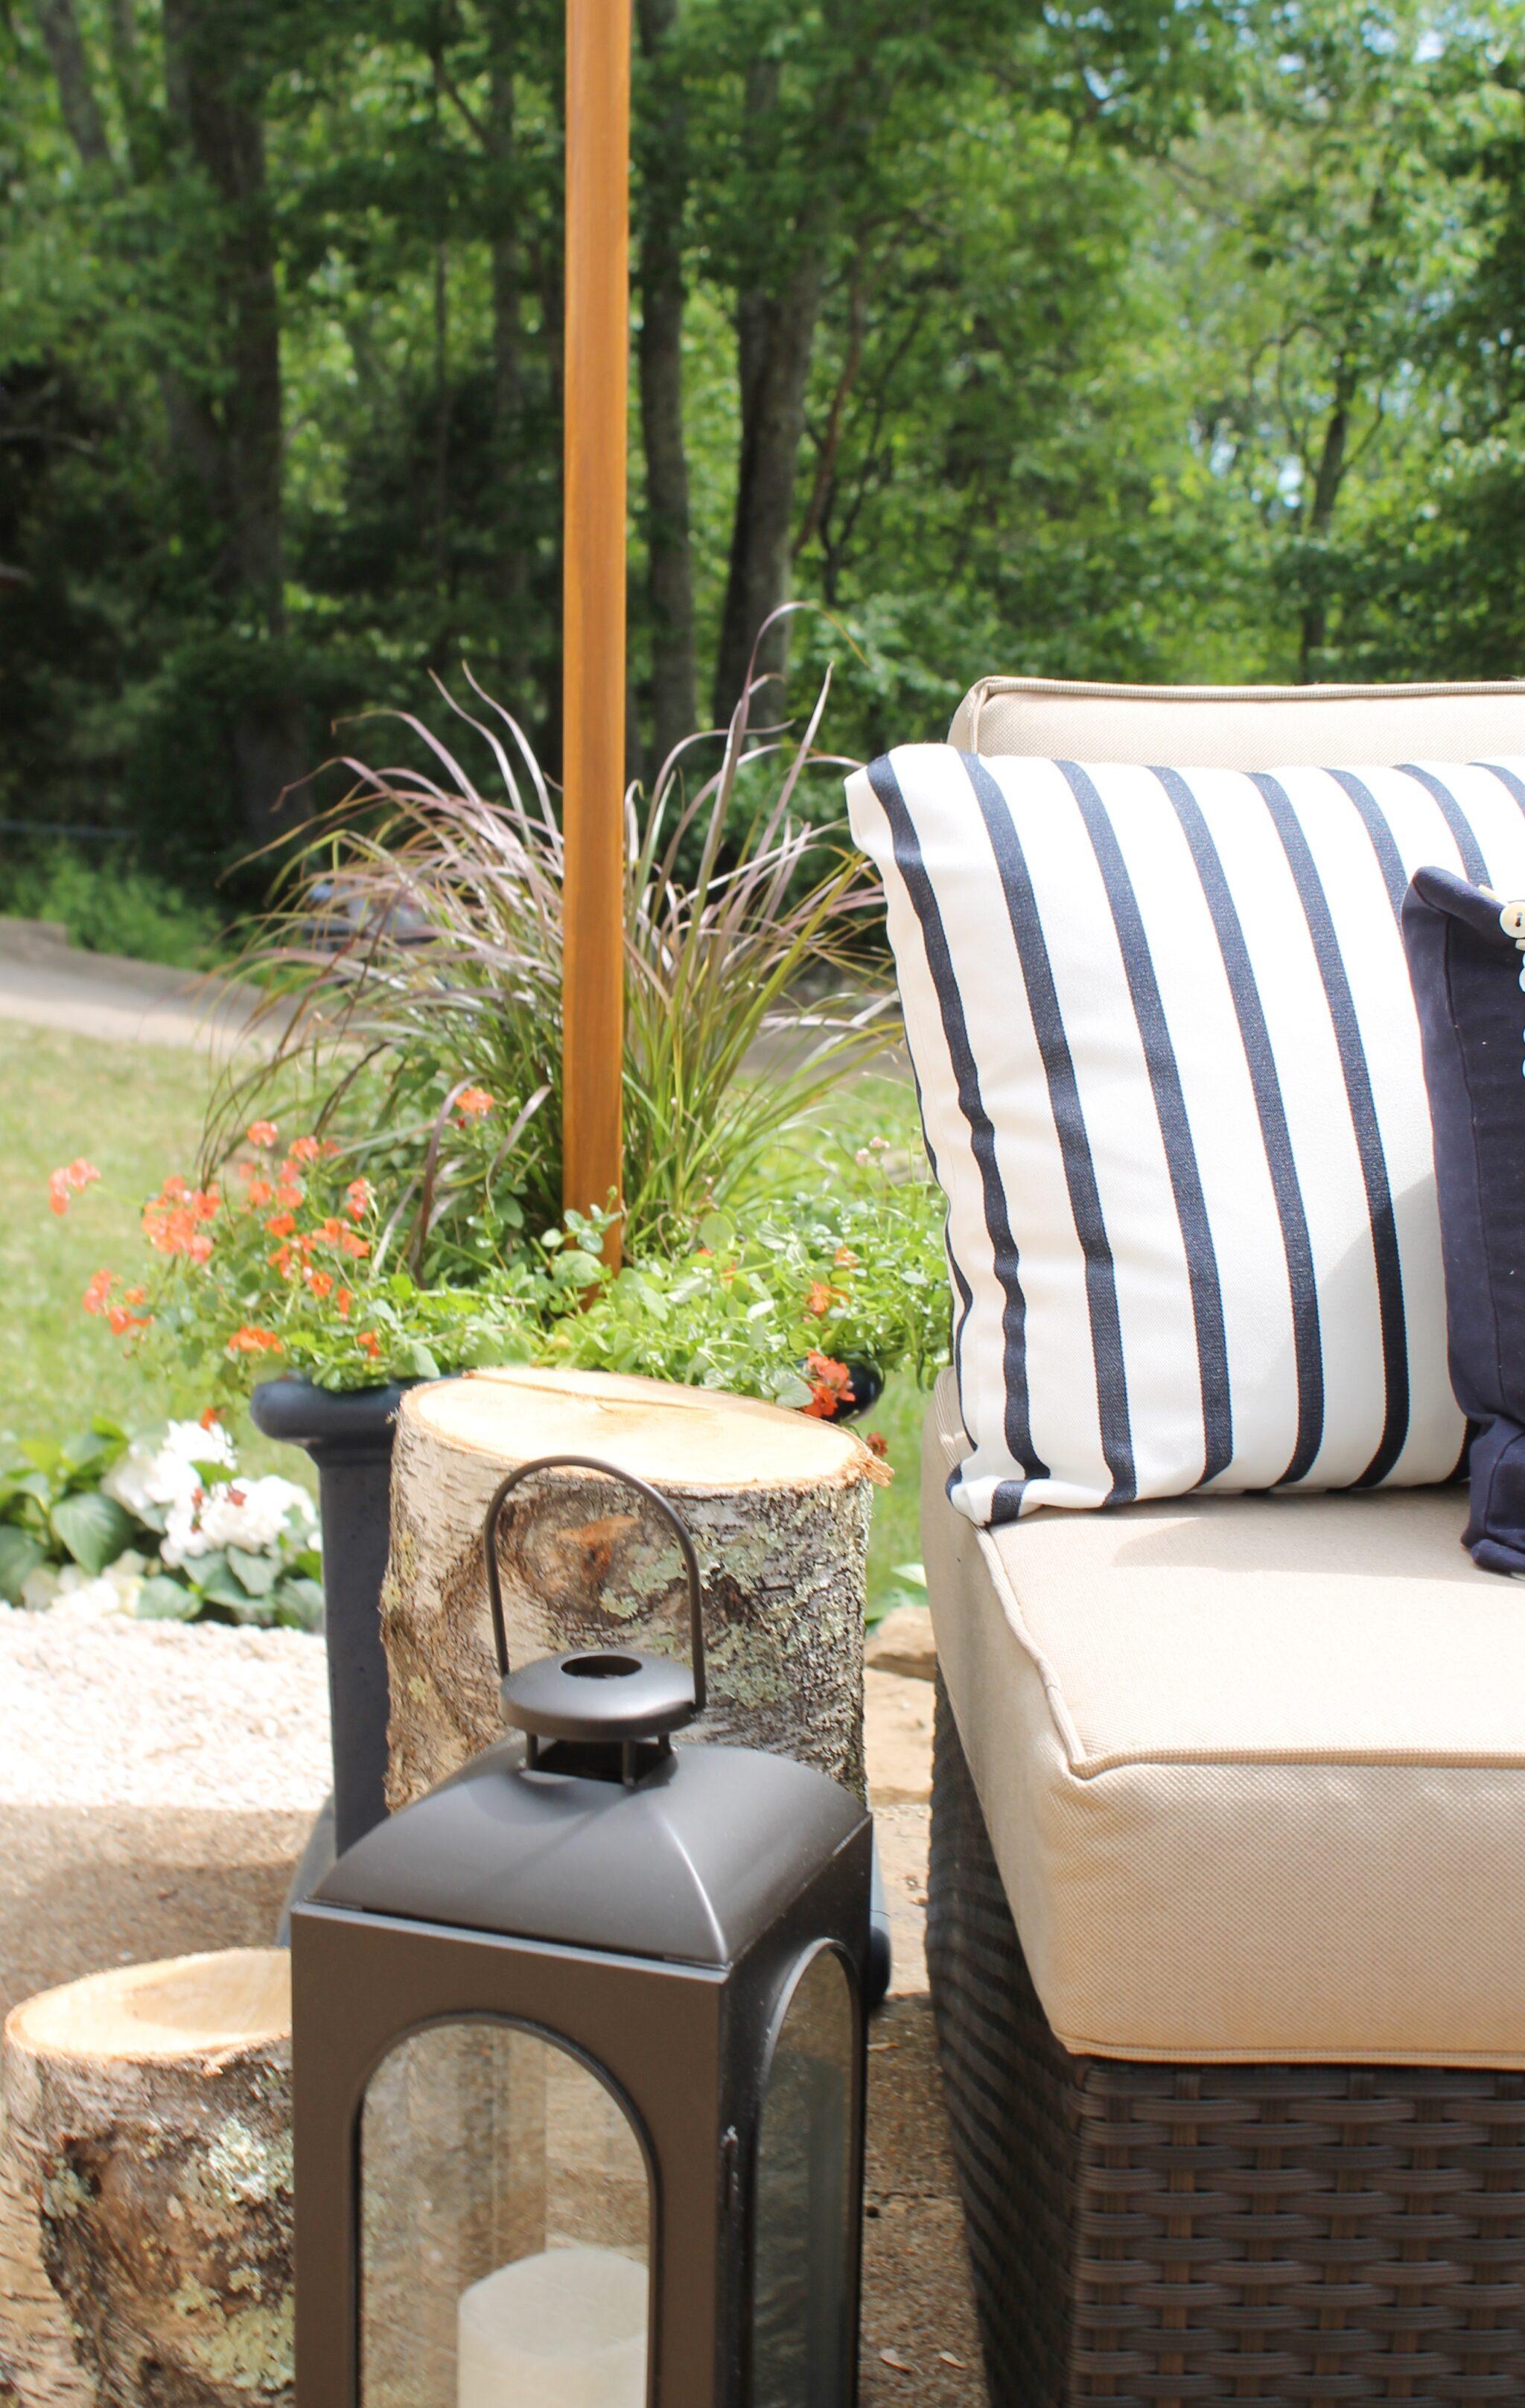 DIY Outdoor Light Poles - City Farmhouse on Backyard String Lights Diy  id=65050